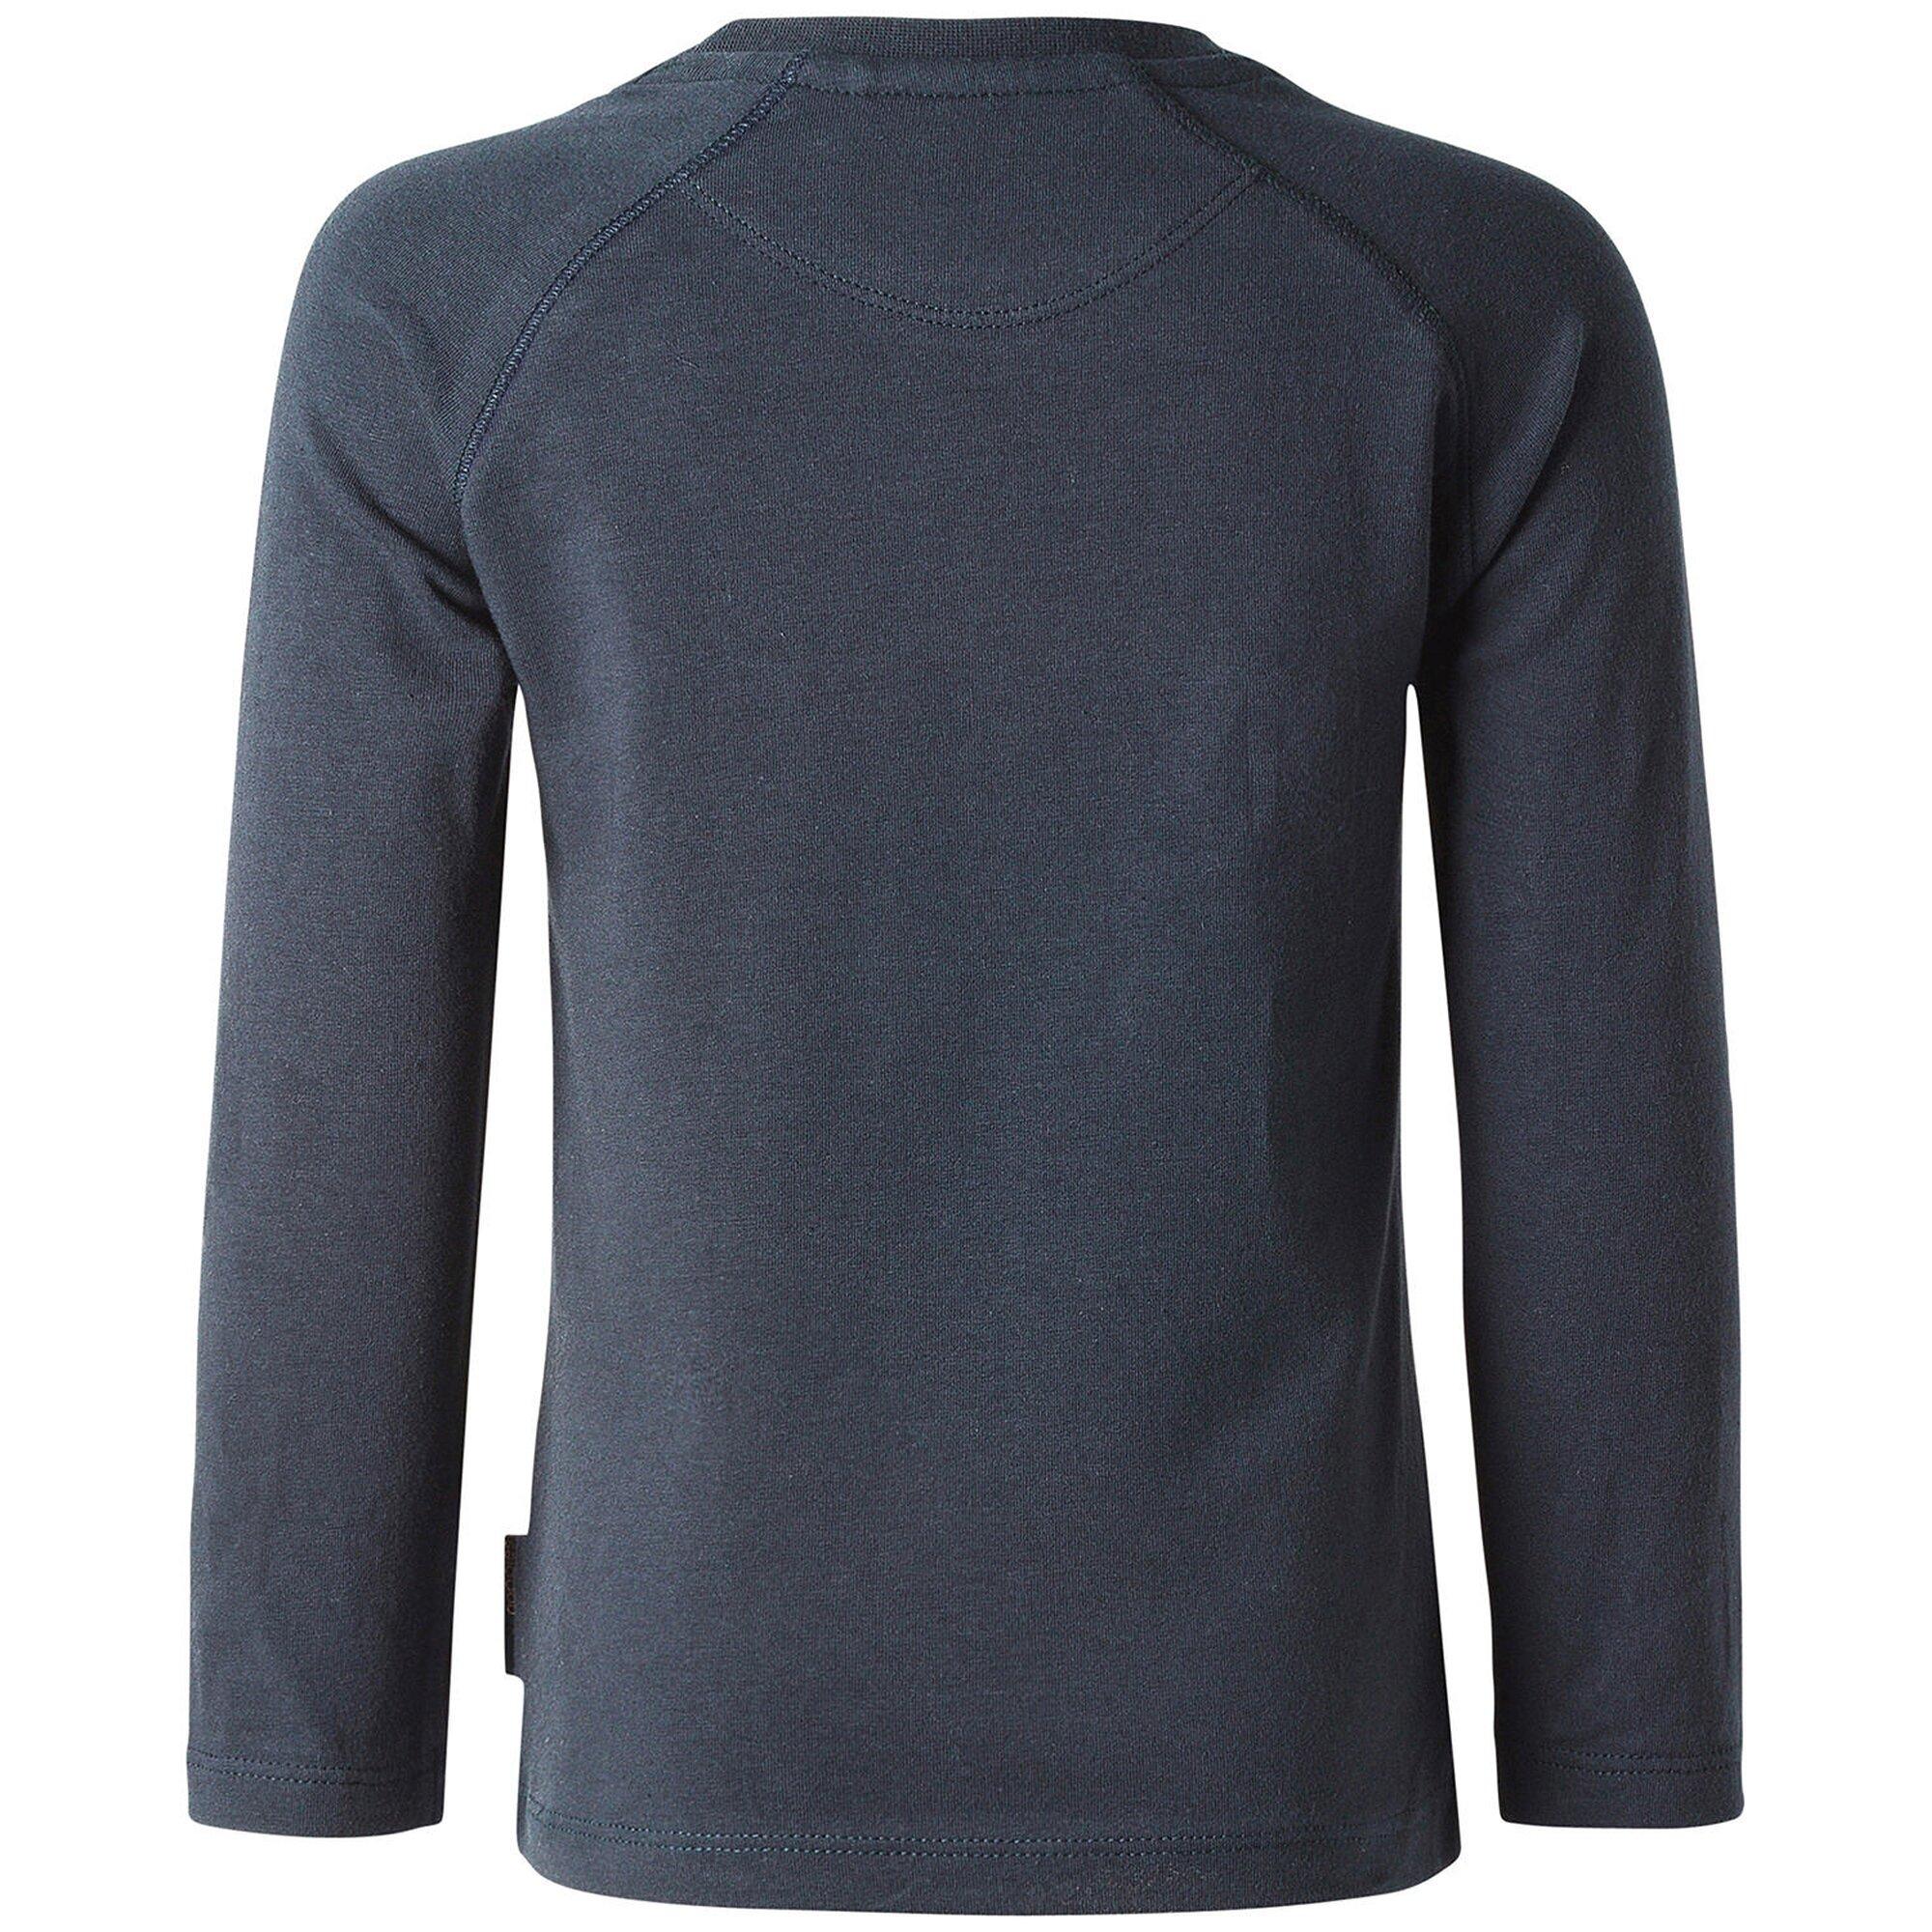 noppies-langarmshirt-islamorada, 19.99 EUR @ babywalz-de